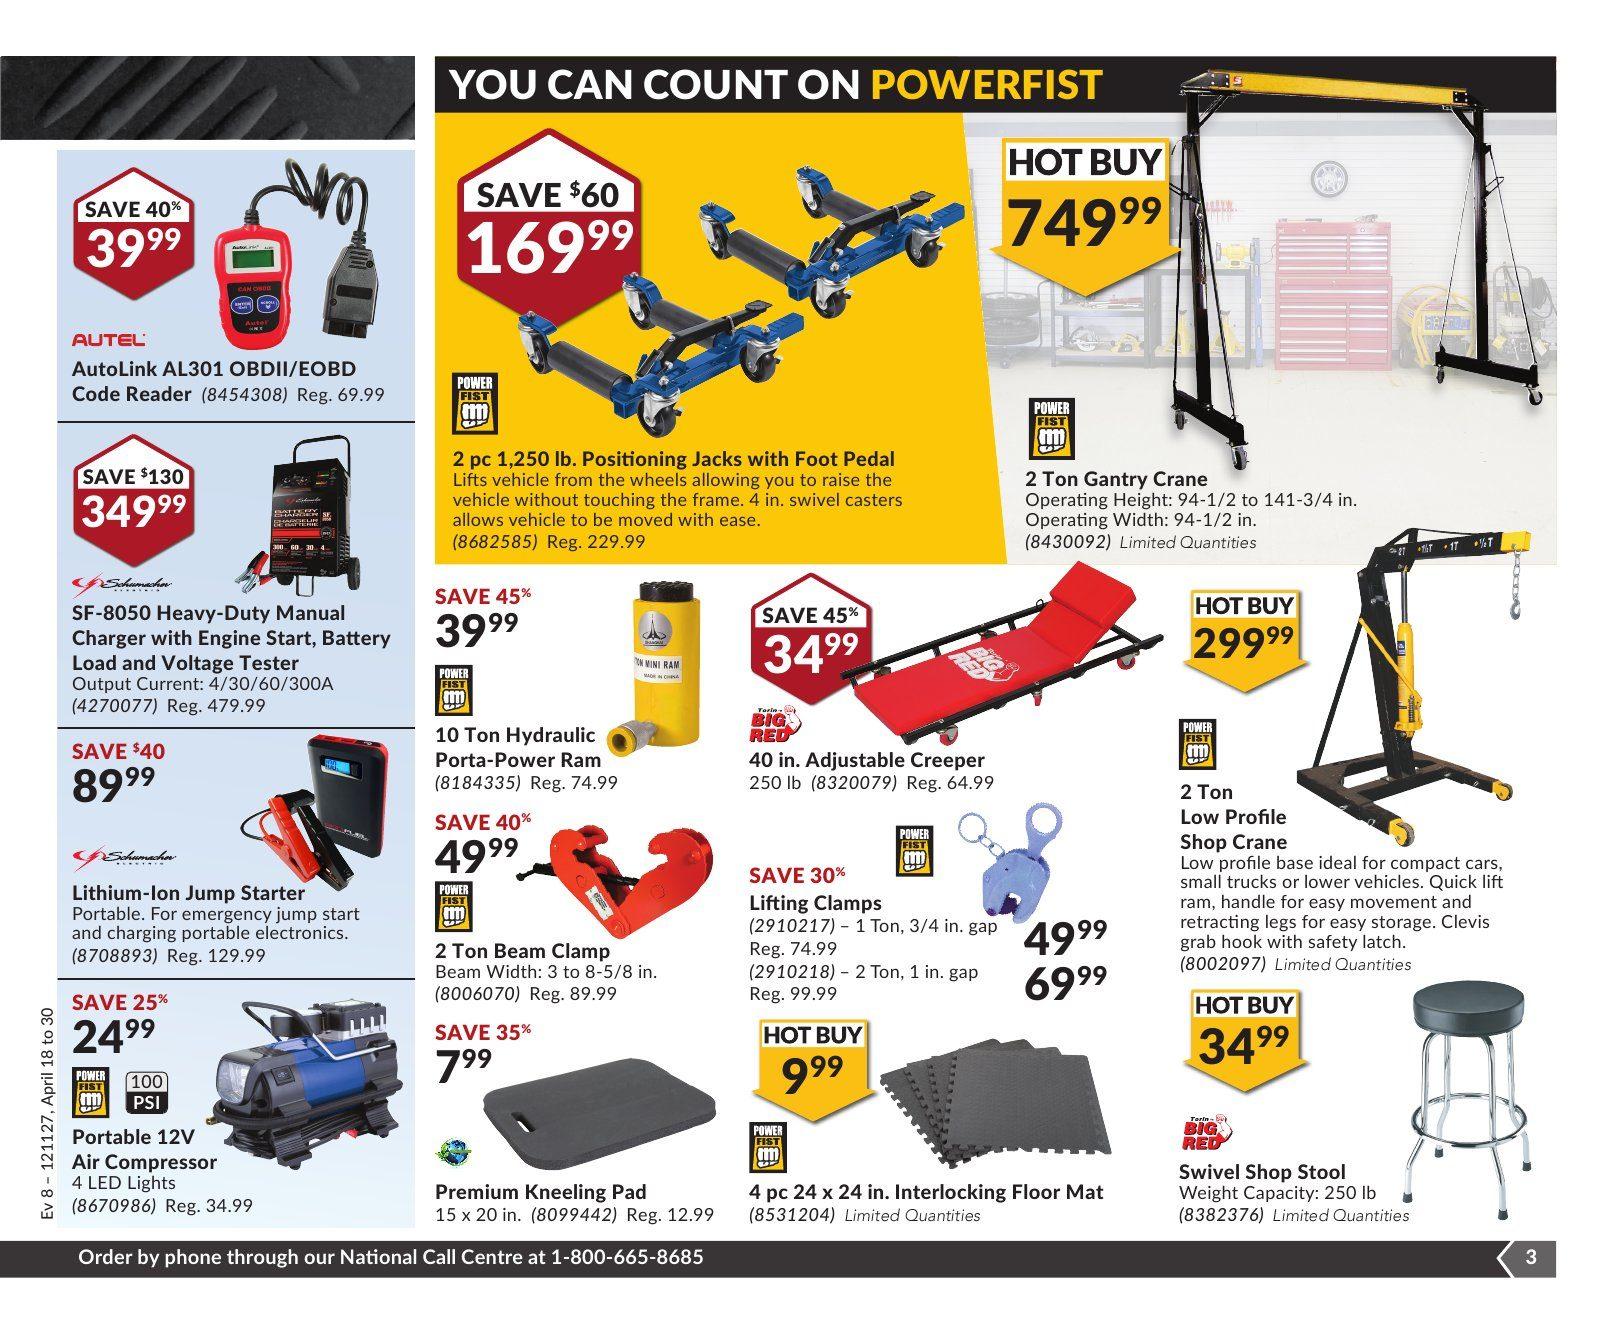 Princess Auto Weekly Flyer Great Garages Start Here Apr 18 30 Barrel Swivel With Interlock Snap Pioneer No 5 7